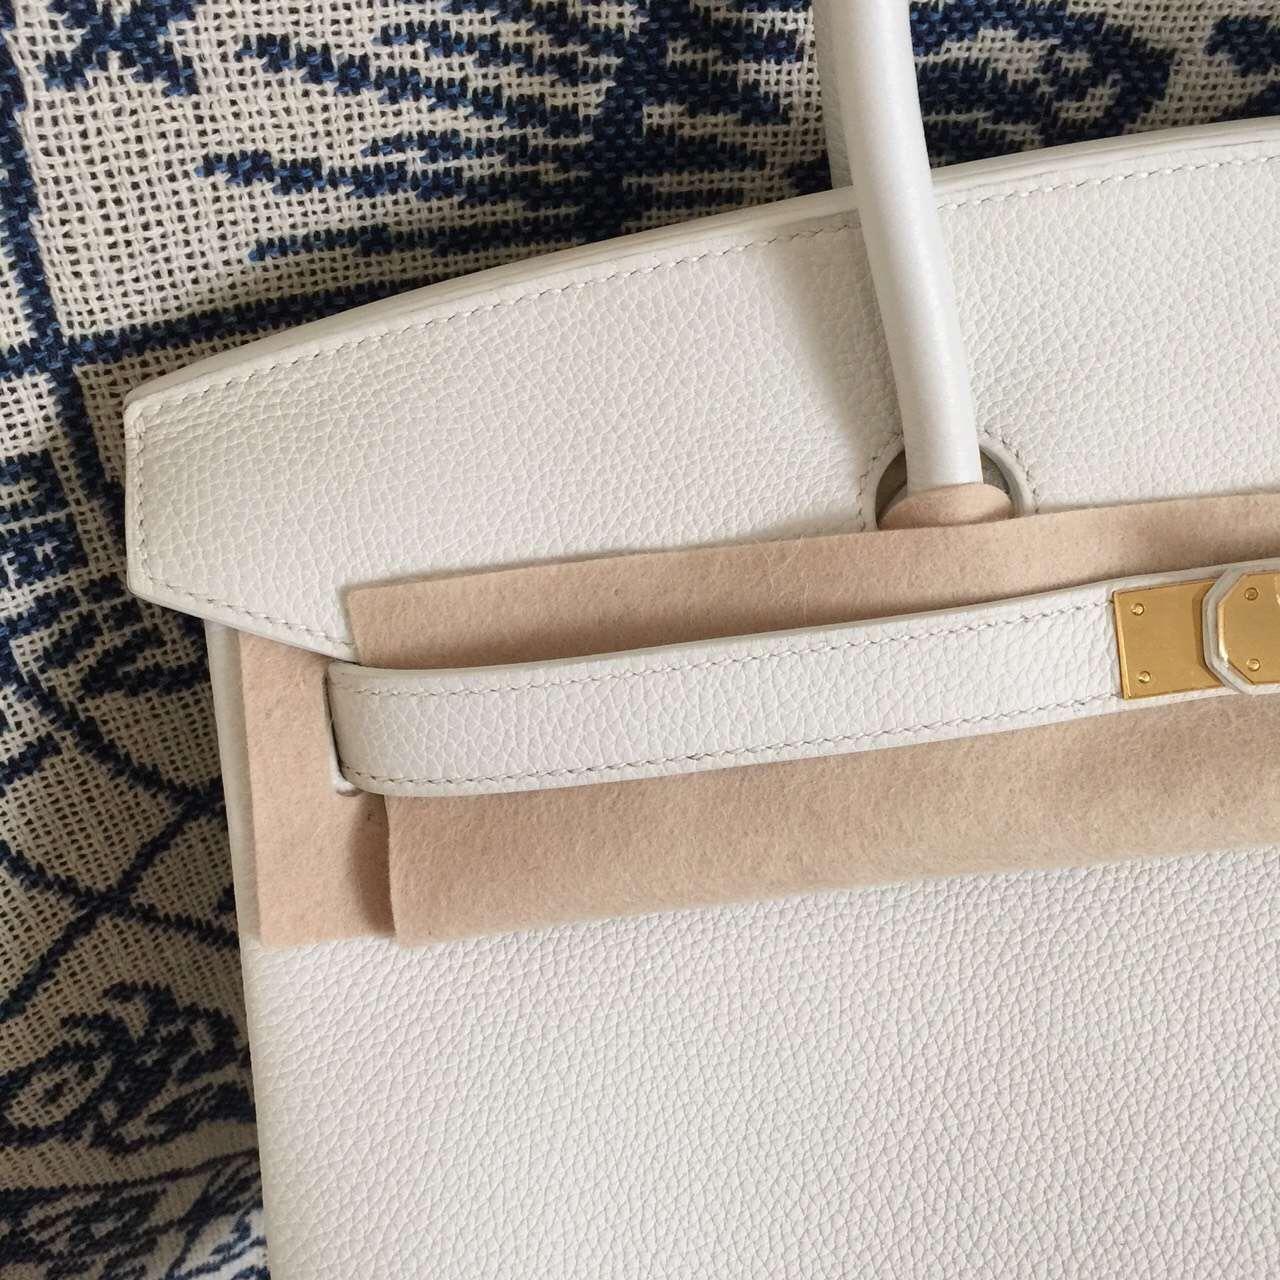 New Fashion Hermes White Togo Leather Birkin Bag 35CM Gold Hardware